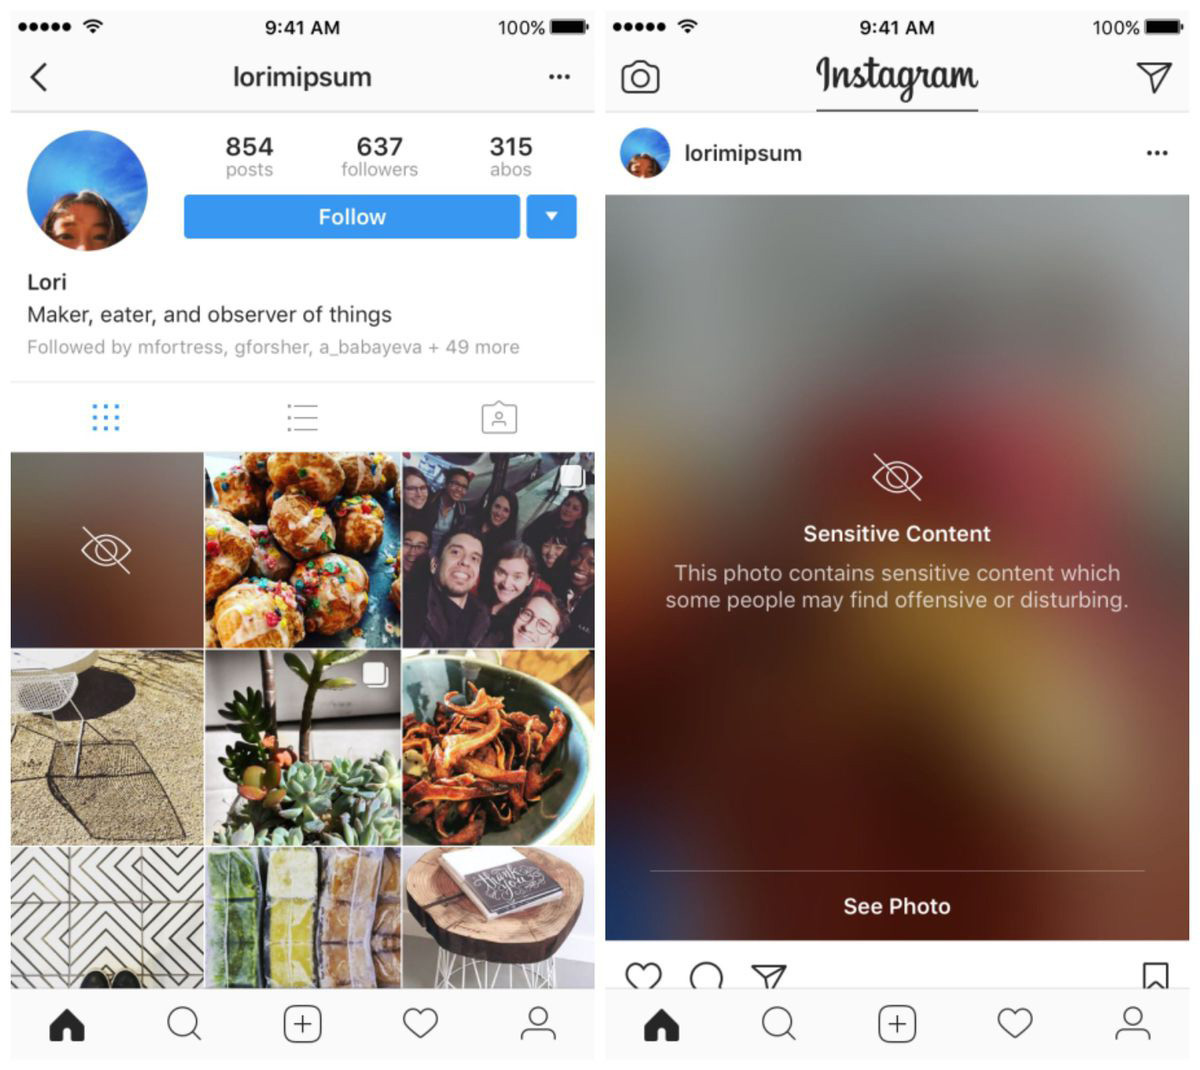 Instagram Sensitive Content Warning